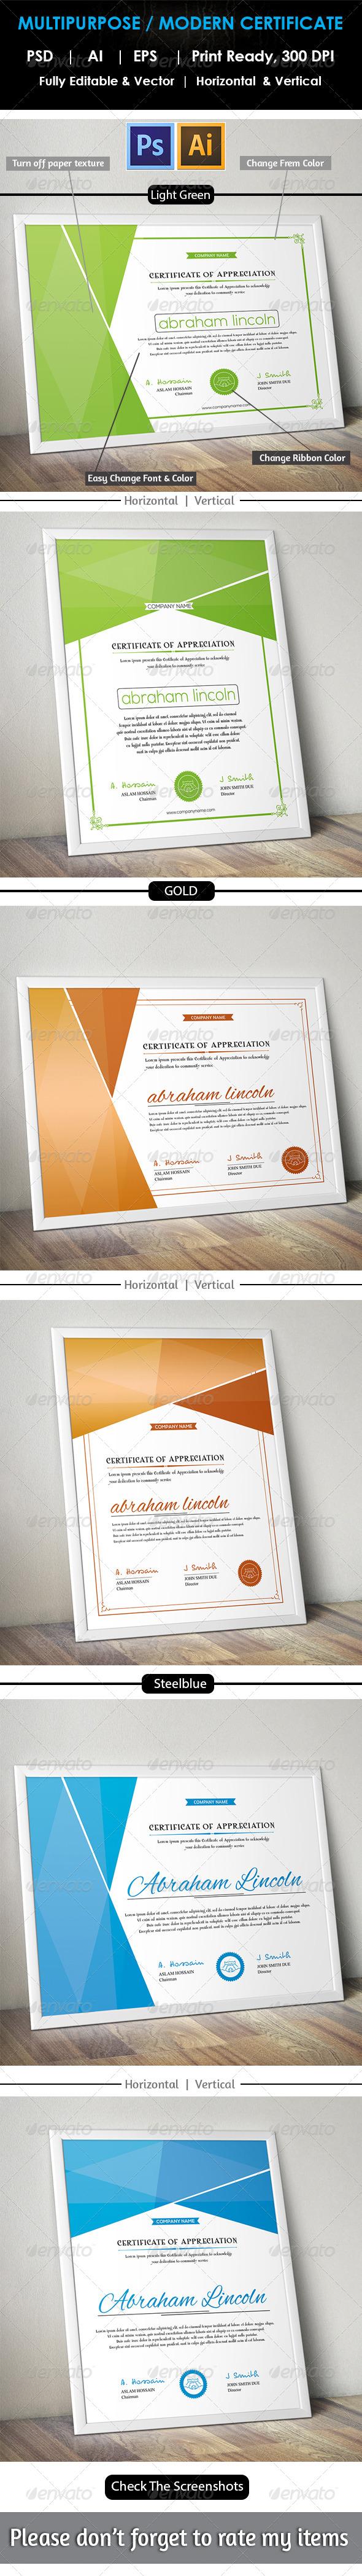 GraphicRiver Simple Multipurpose Certificate GD012 8620898